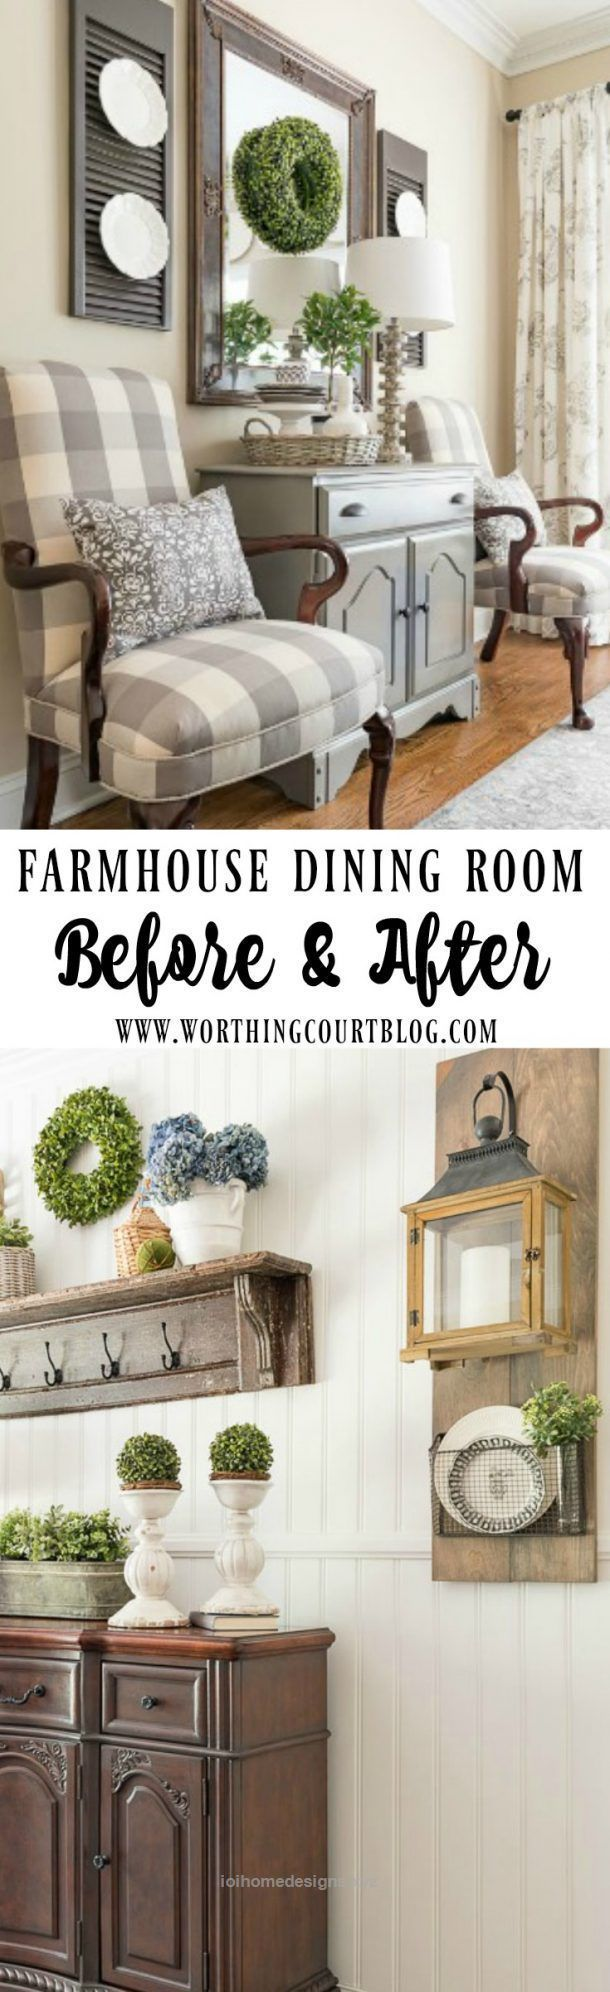 Cool Farmhouse Dining Room Makeover Reveal – Before And After  The post  Farmhouse Dining Room Makeover Reveal – Before And After…  appeared first on  I.O.I Designs .